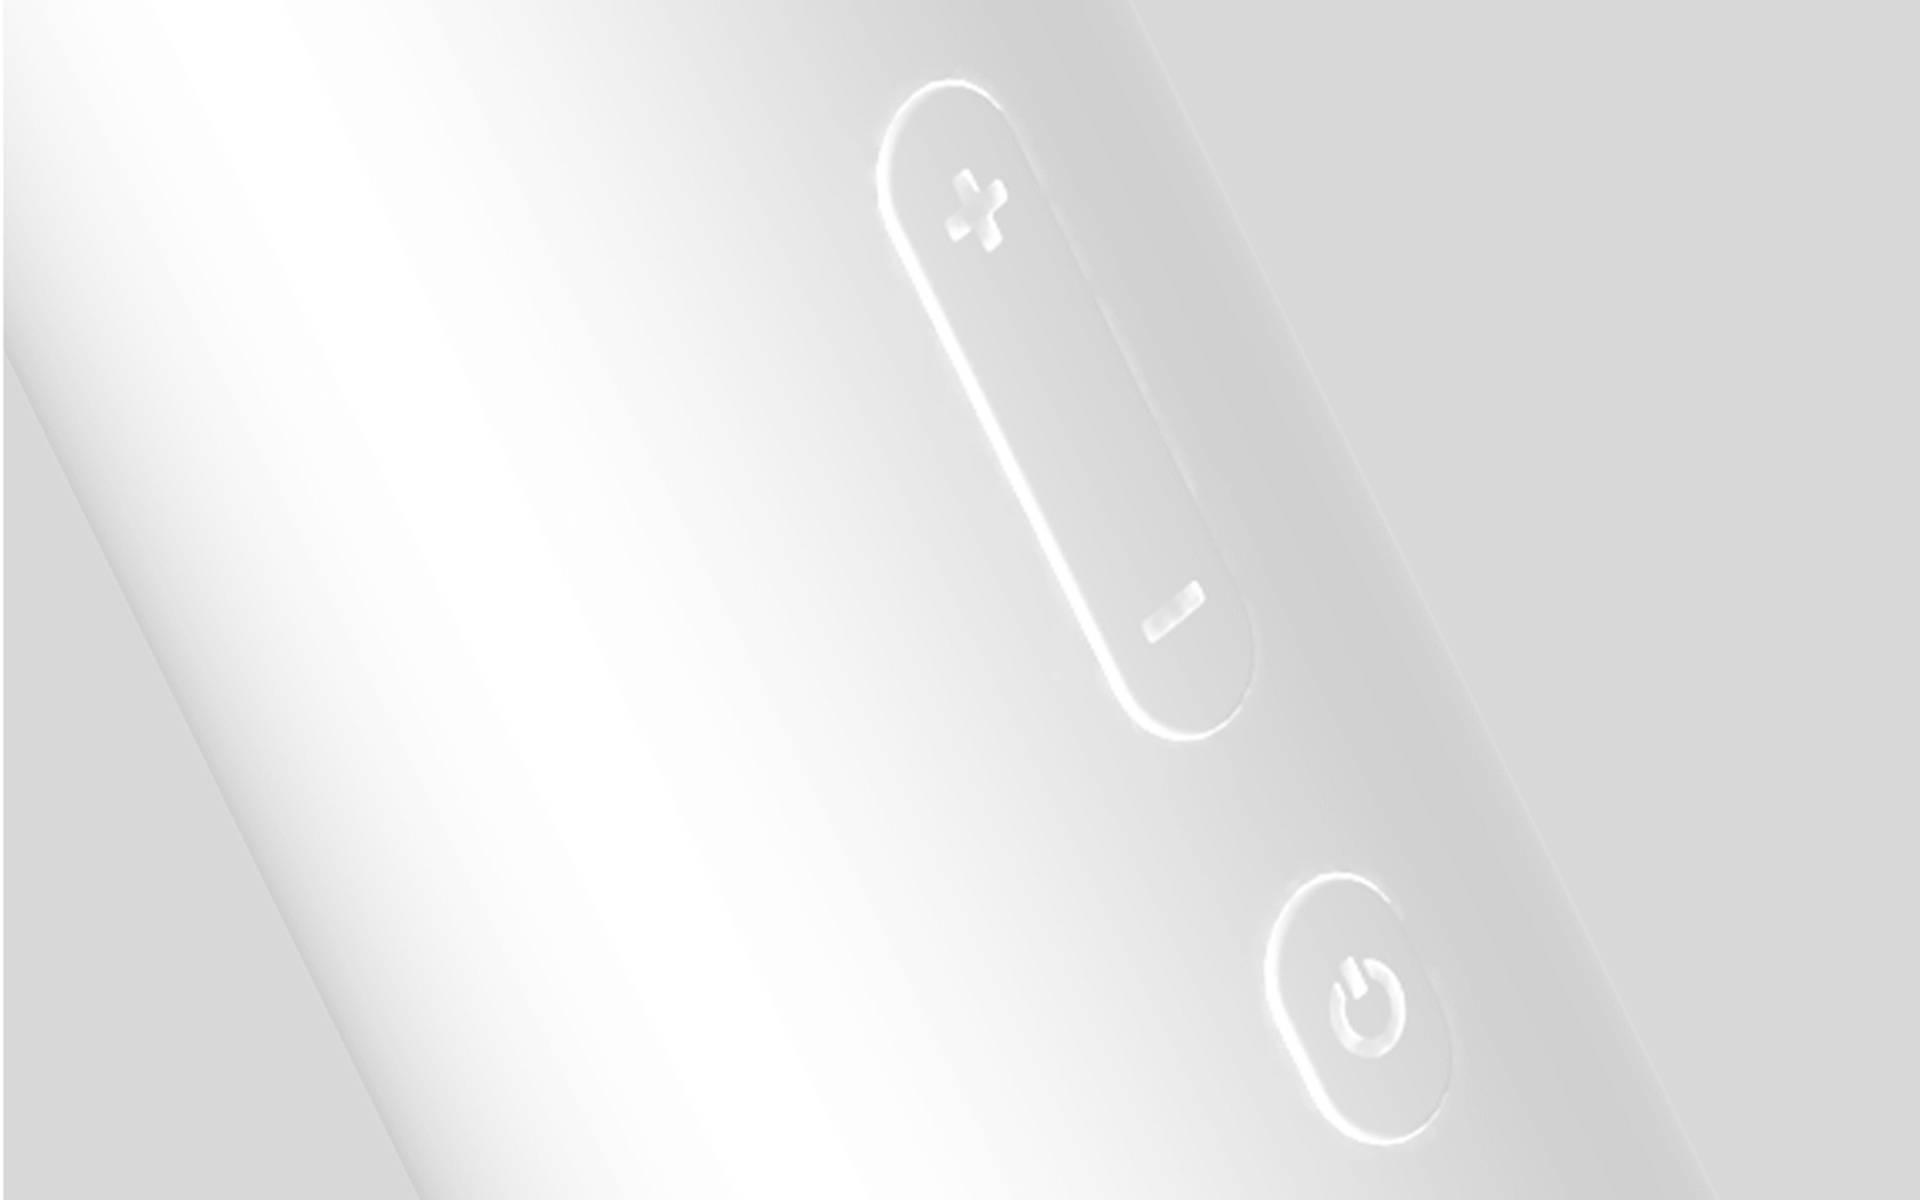 ajustar el volumen presionando la tecla arriba o abajo